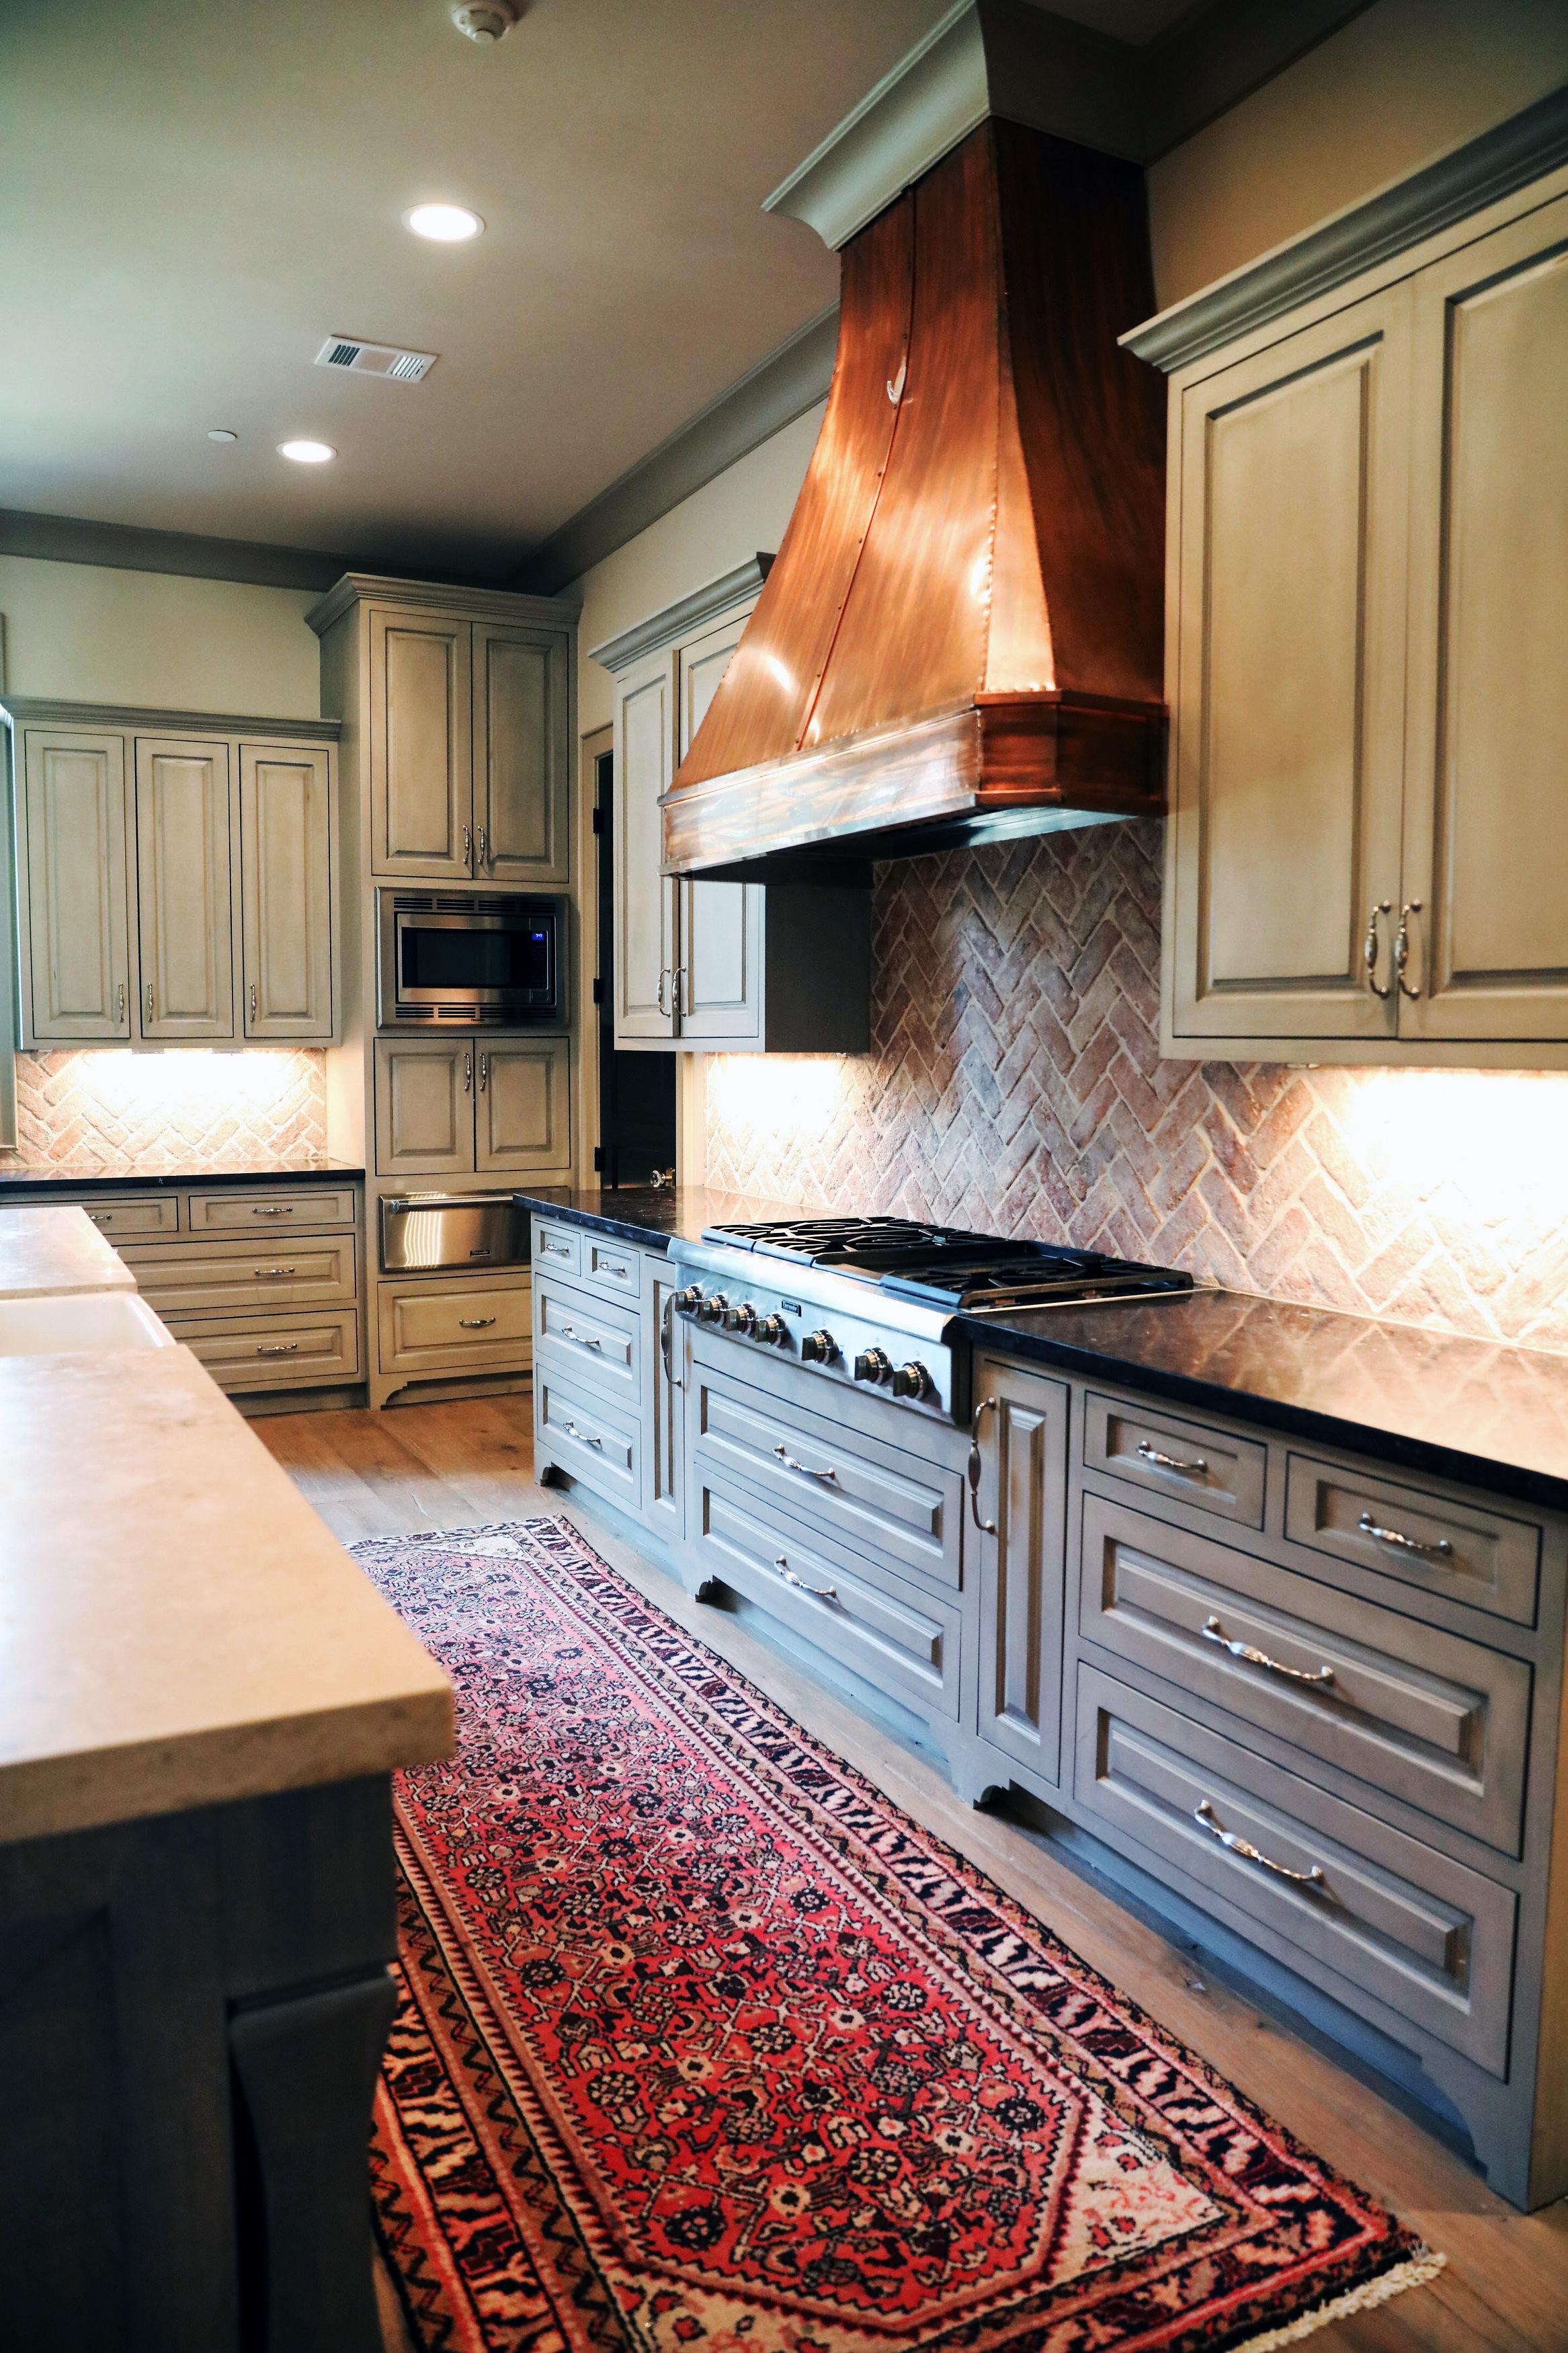 Kitchen cabinet design Houston - Memorial Cabinetry Houston, TX